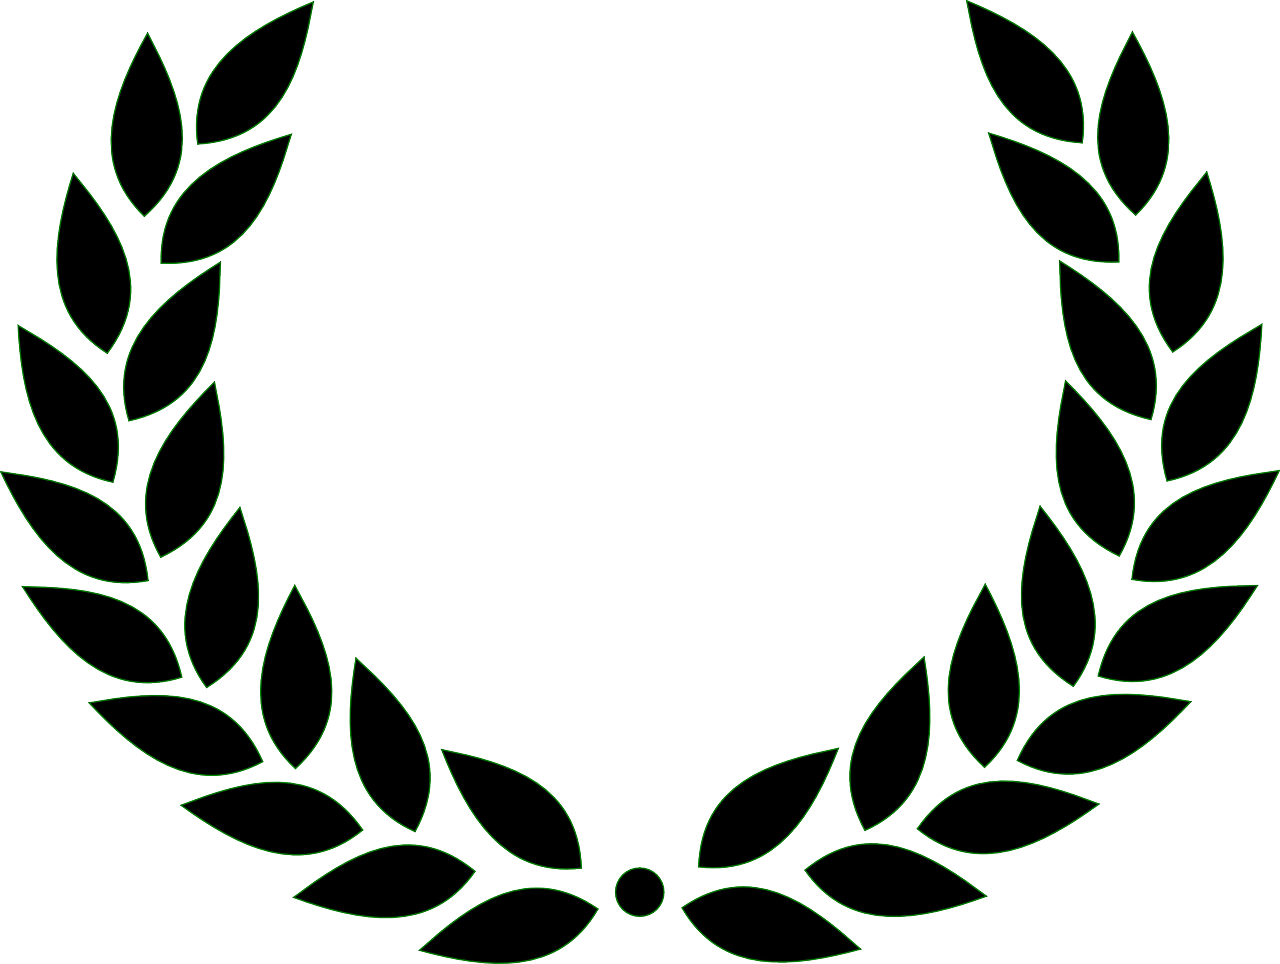 Silver standard performance award. Laurel clipart garland